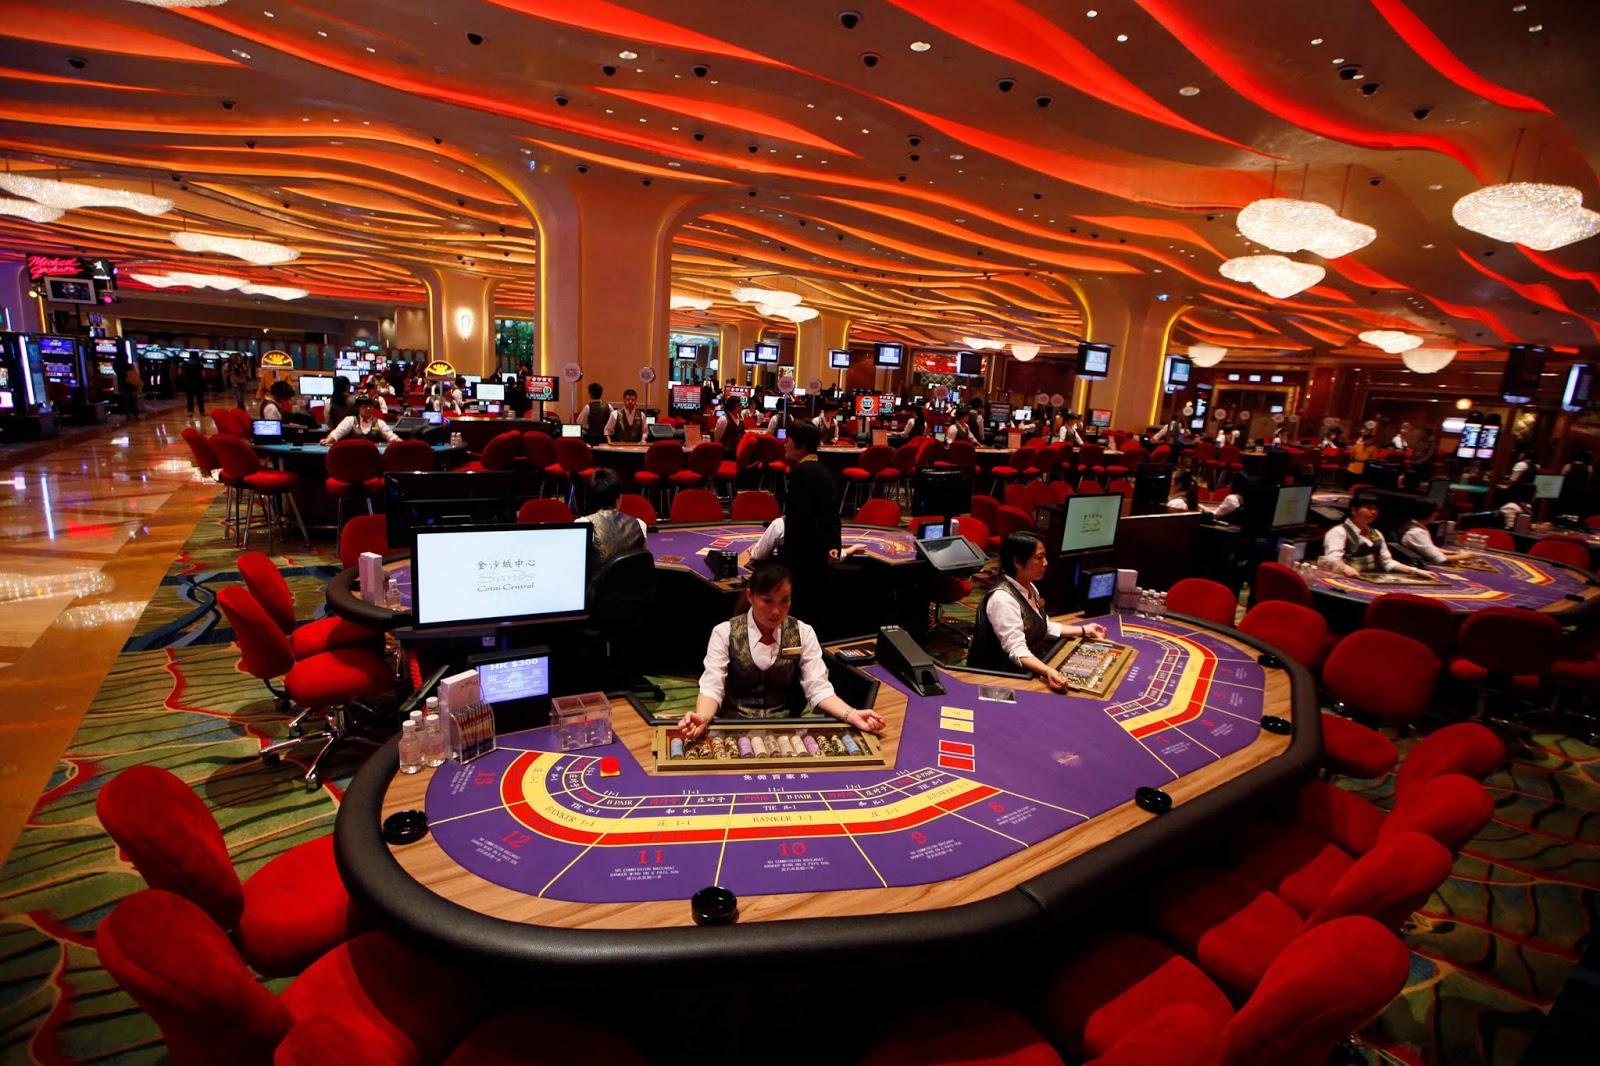 Vinpearl Casino Phú Quốc